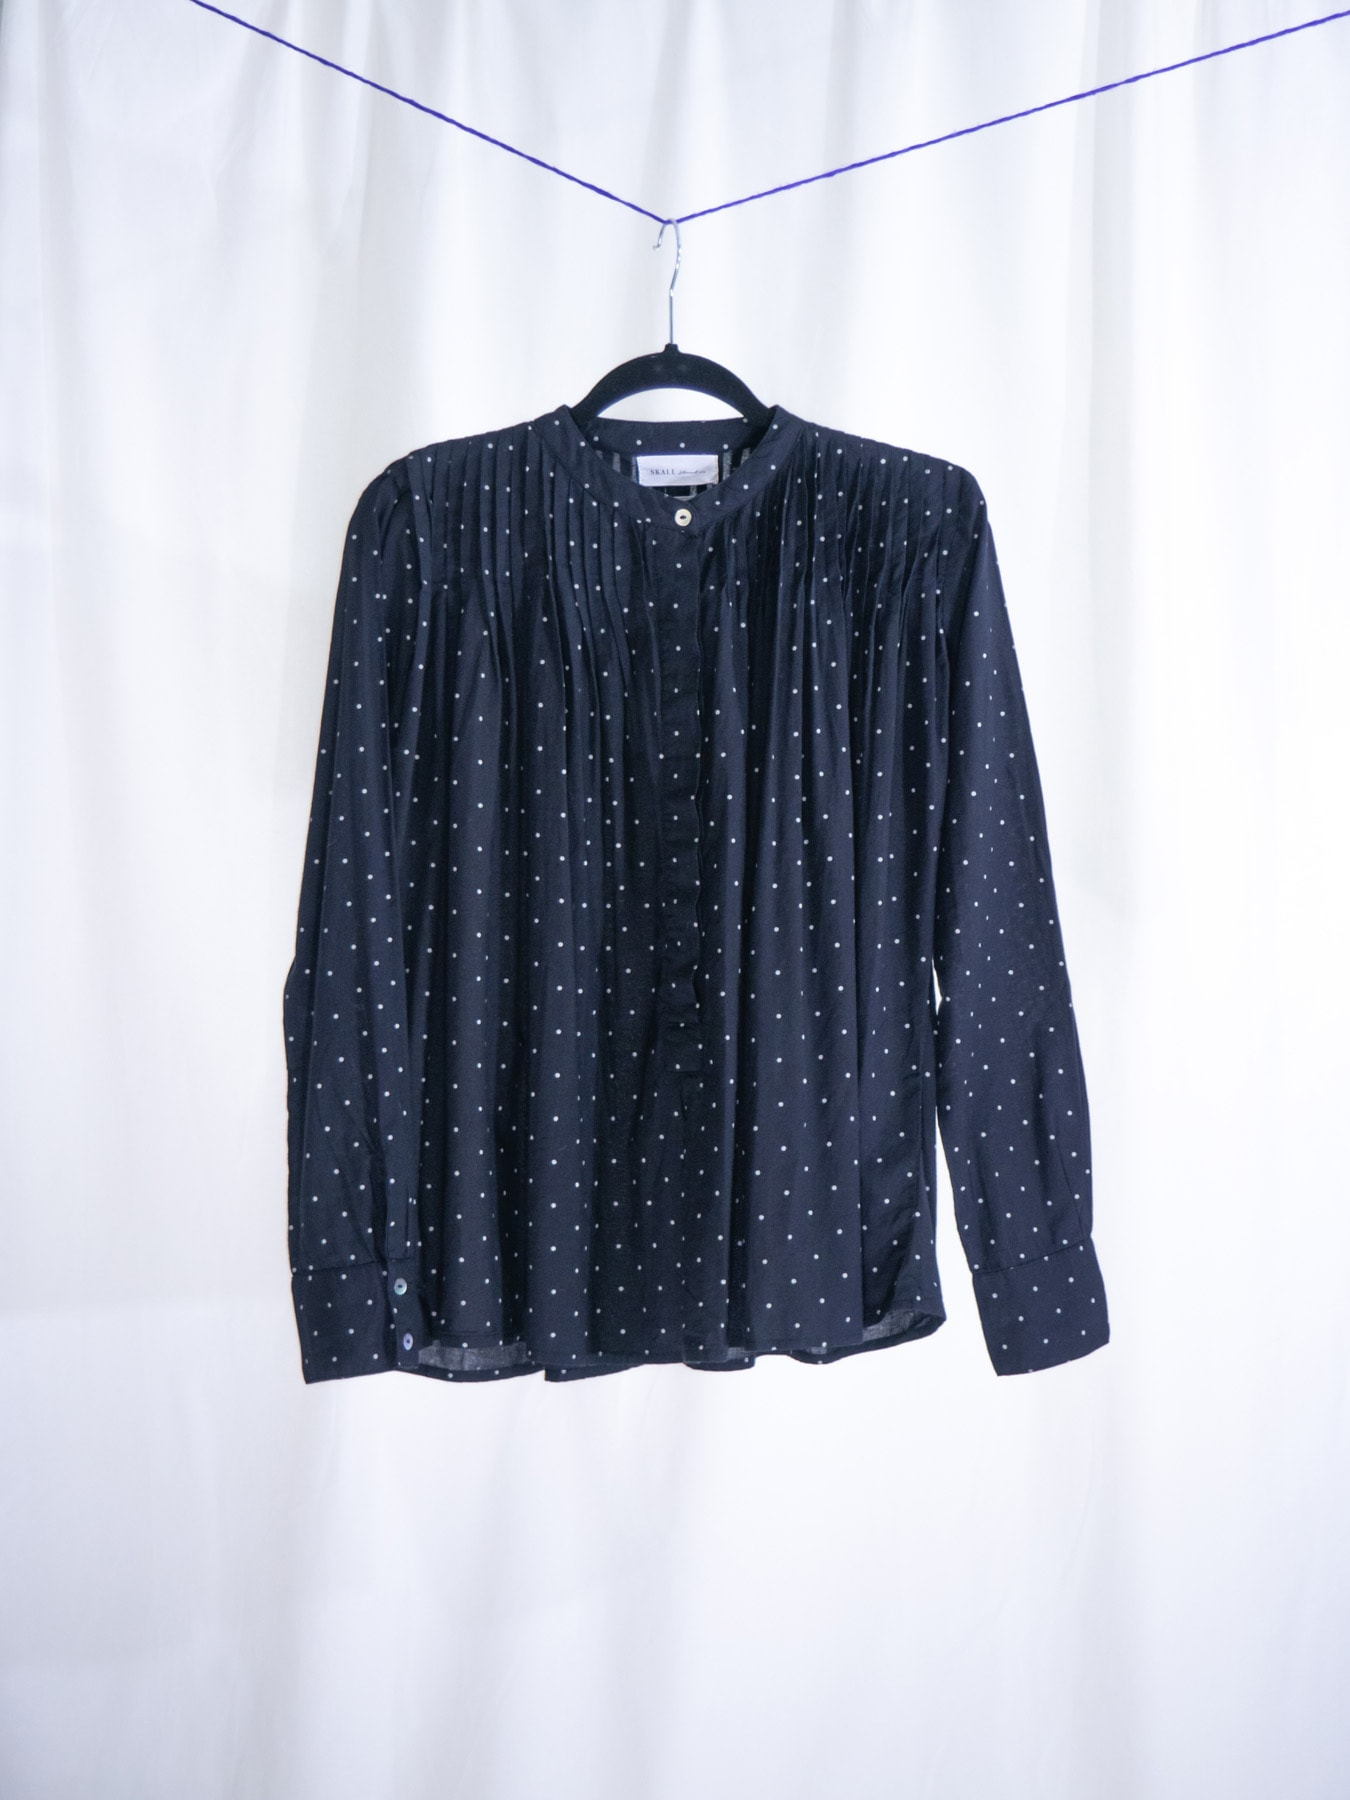 Dot shirt